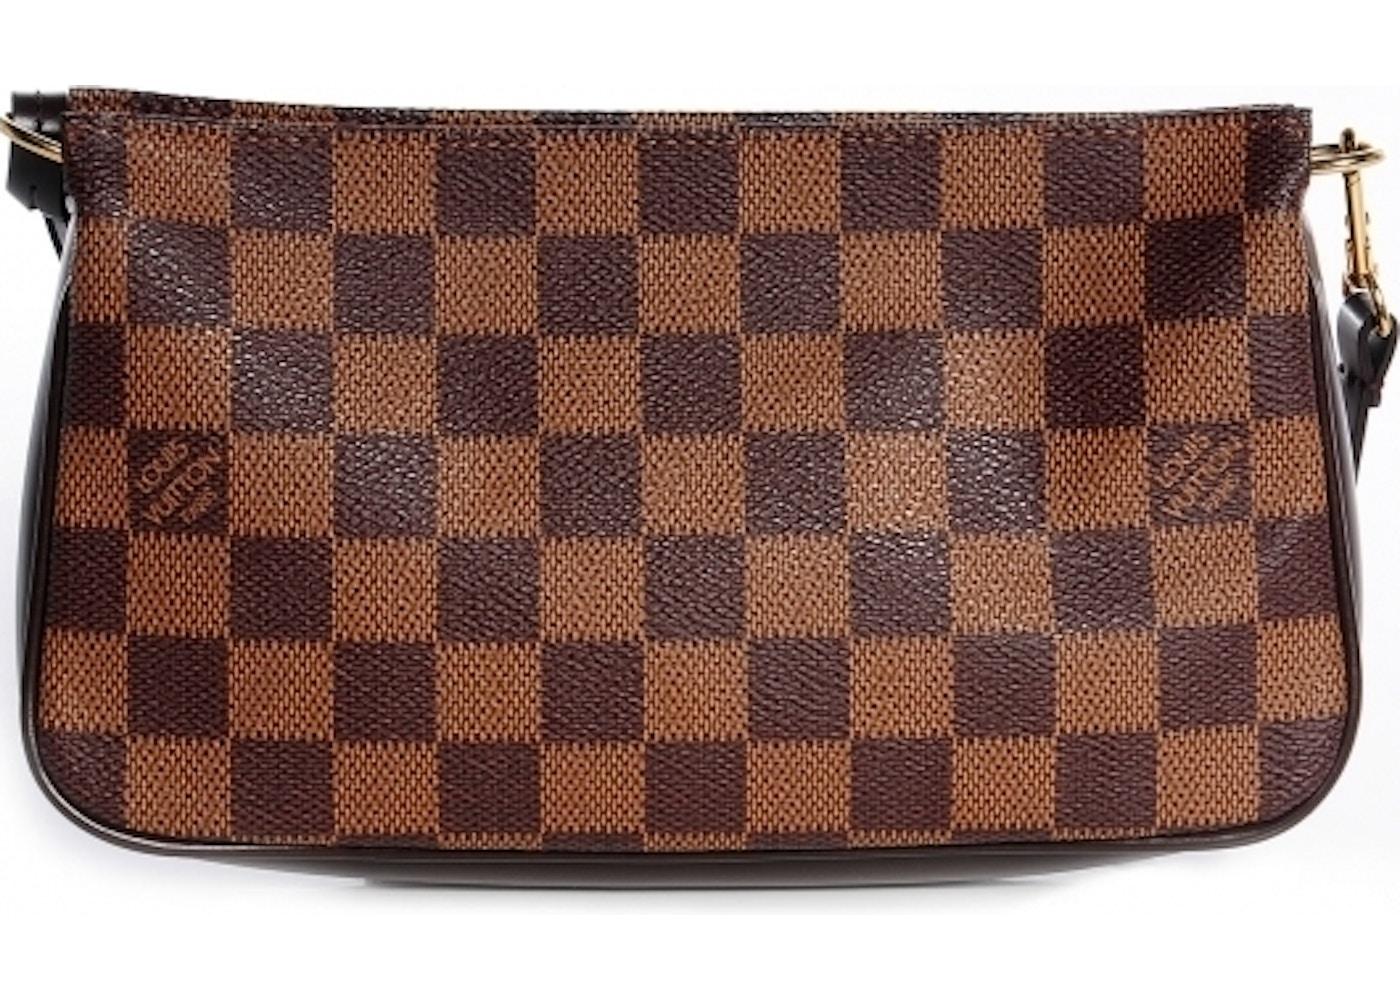 cfdec33d7e25 Louis Vuitton Navona Pochette Accessories Damier Ebene Brown. Damier Ebene  Brown